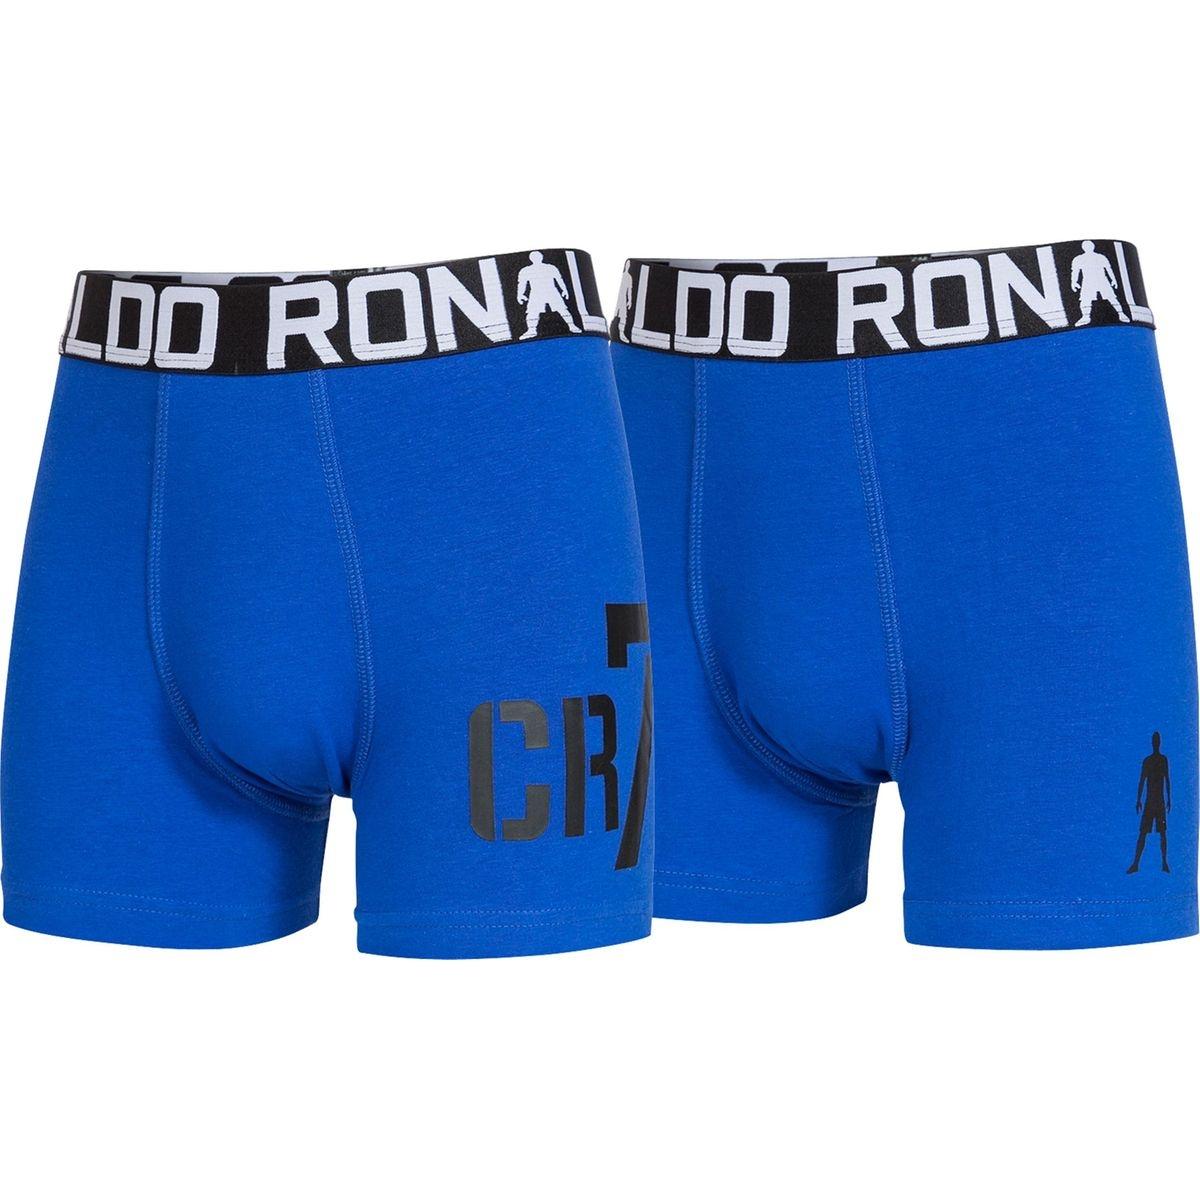 CR7 CRISTIANO RONALDO Caleçon Boys Trunk Lot de 2